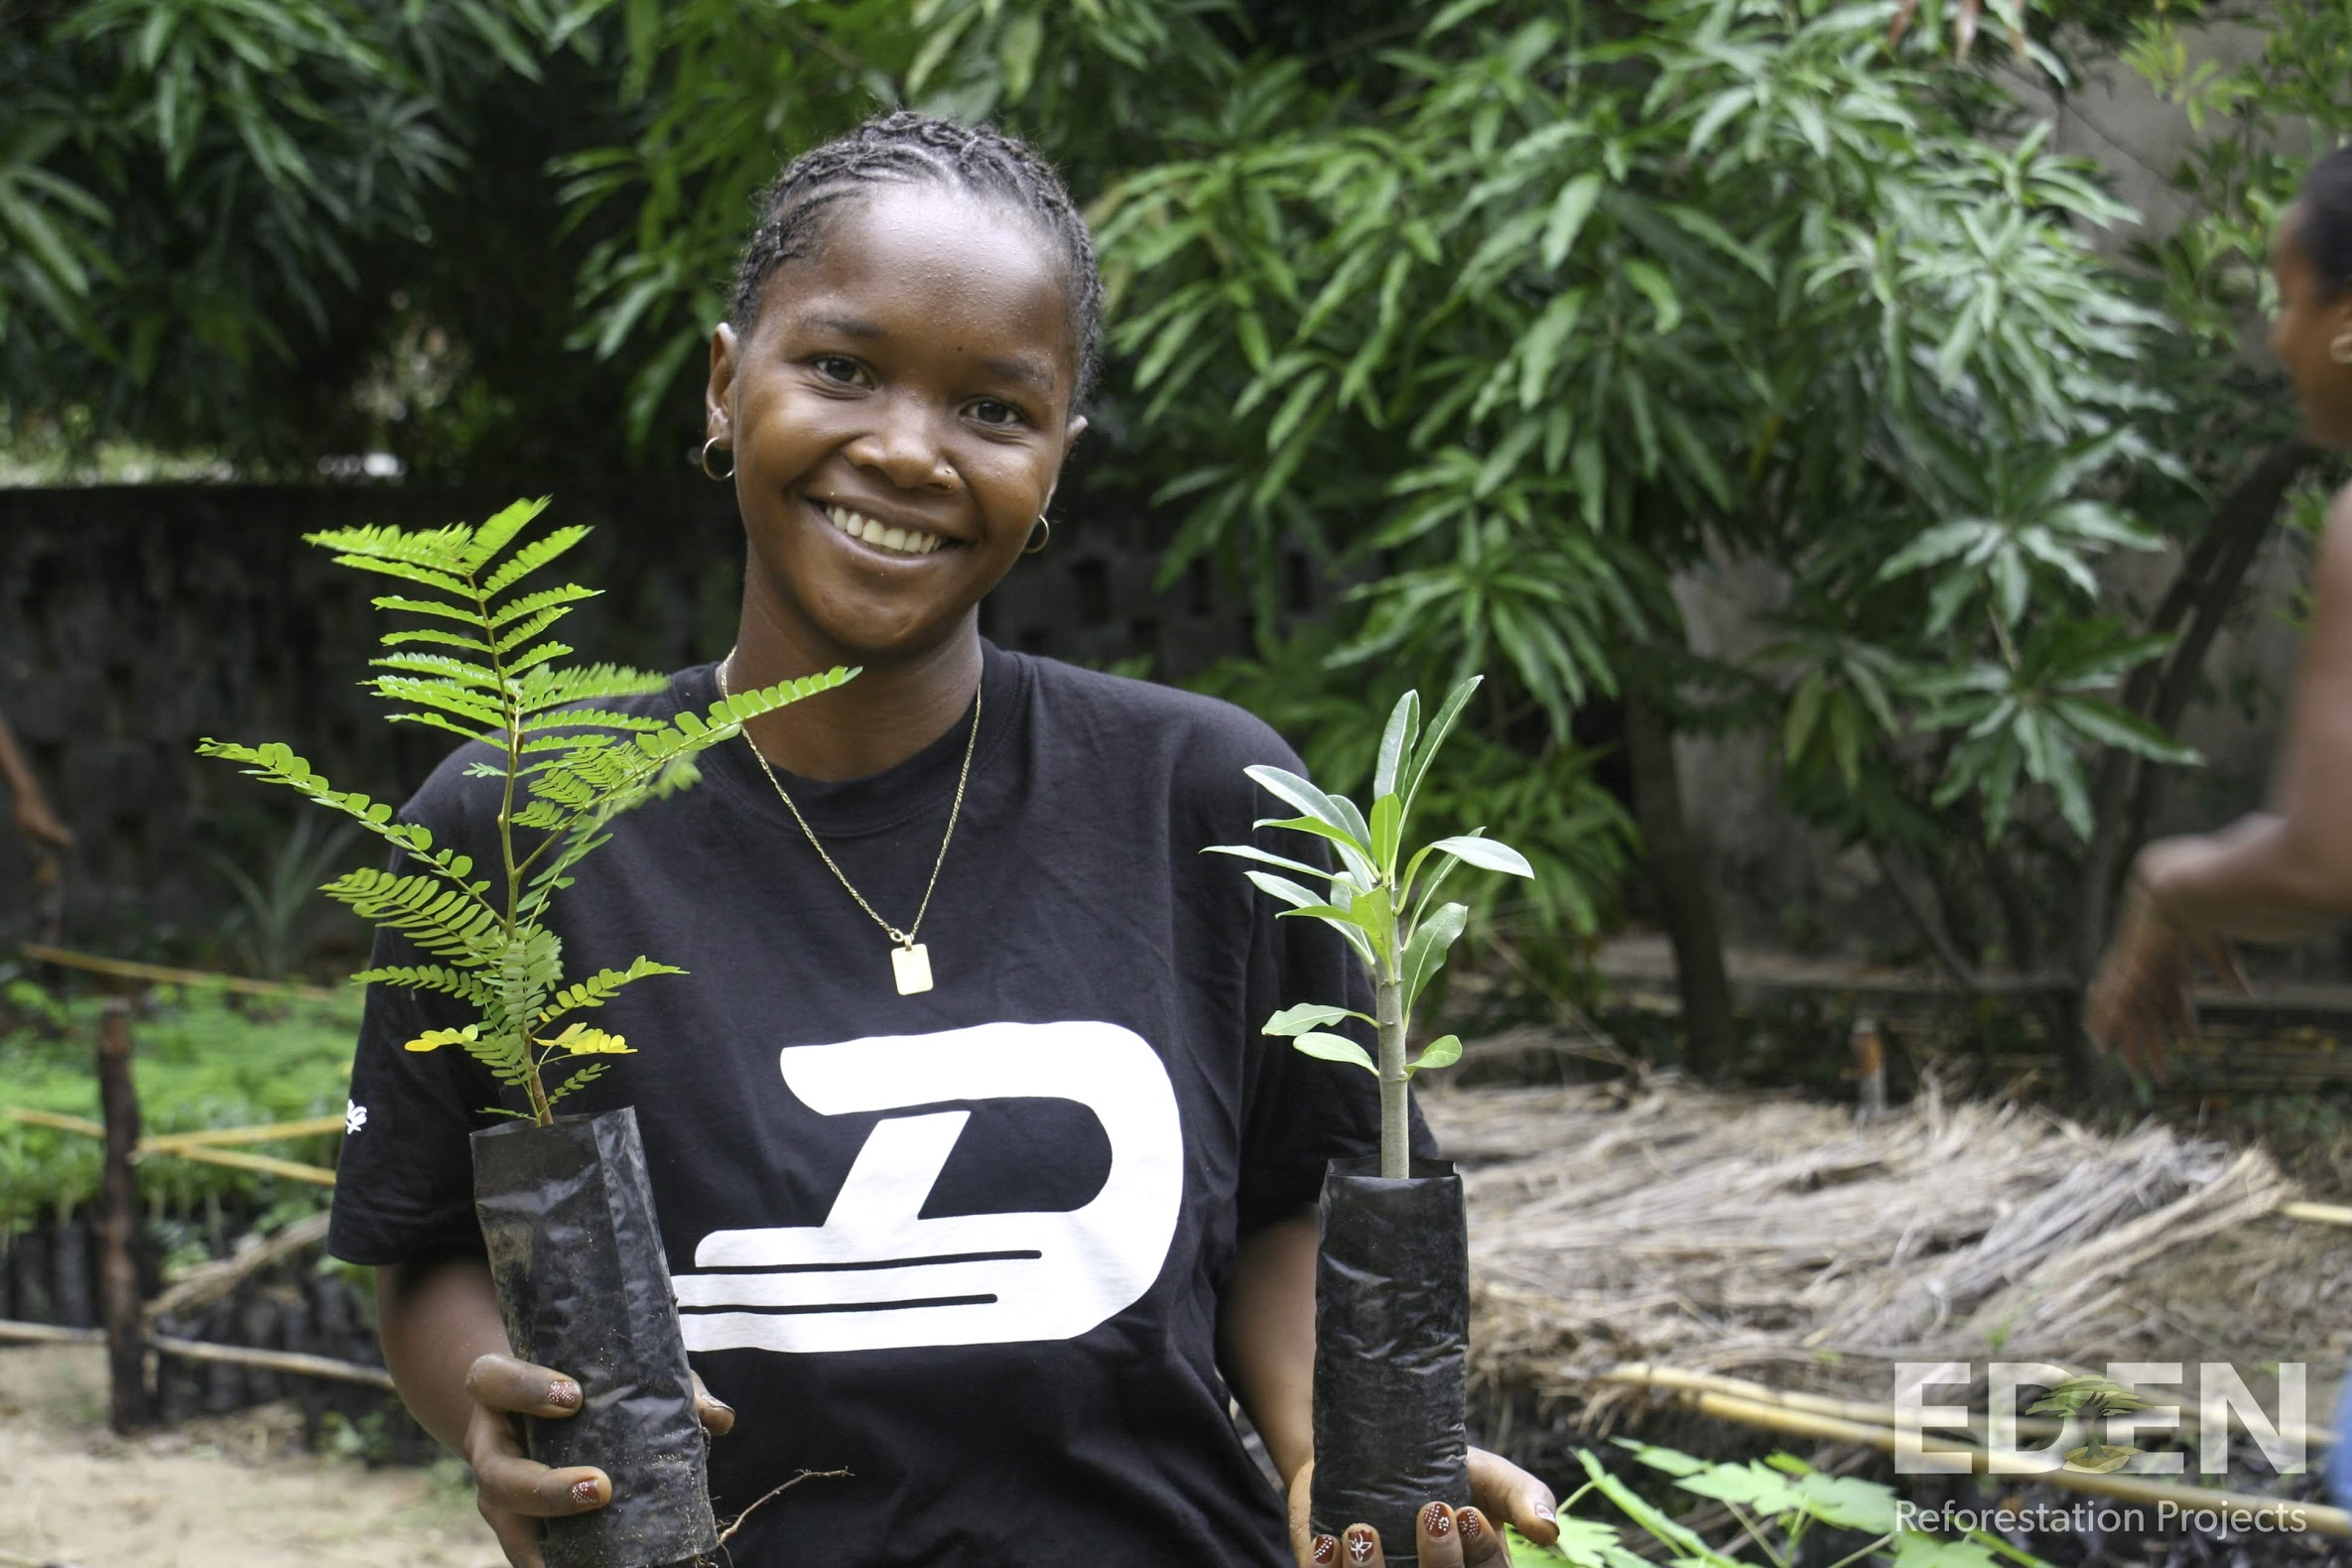 Madagascar_2013_Mamatiana holding seedlings.jpg